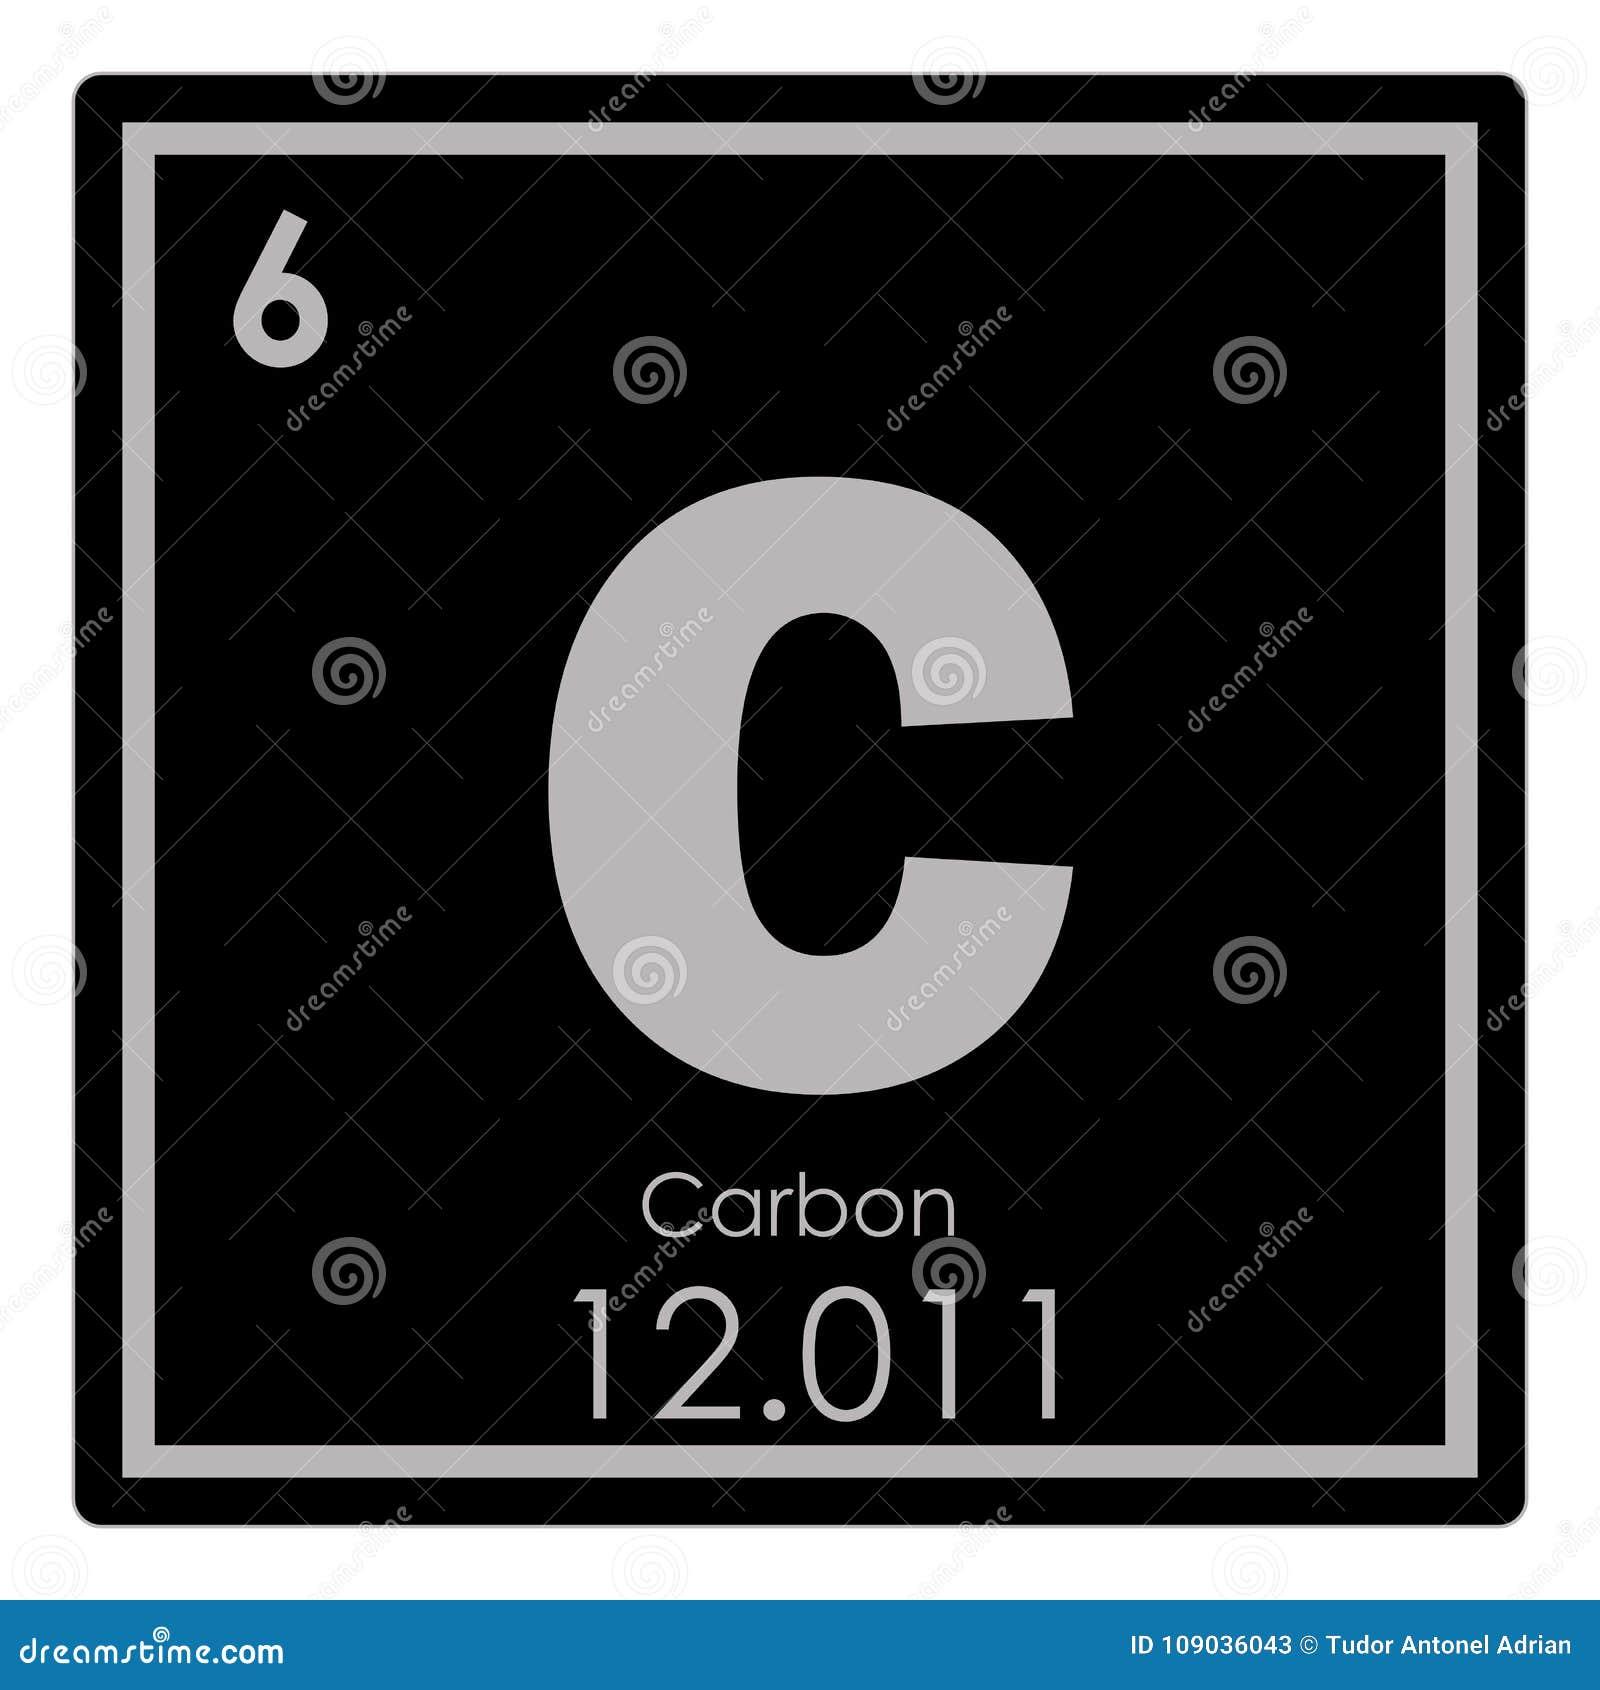 Carbon Chemical Element Stock Illustration Illustration Of Science